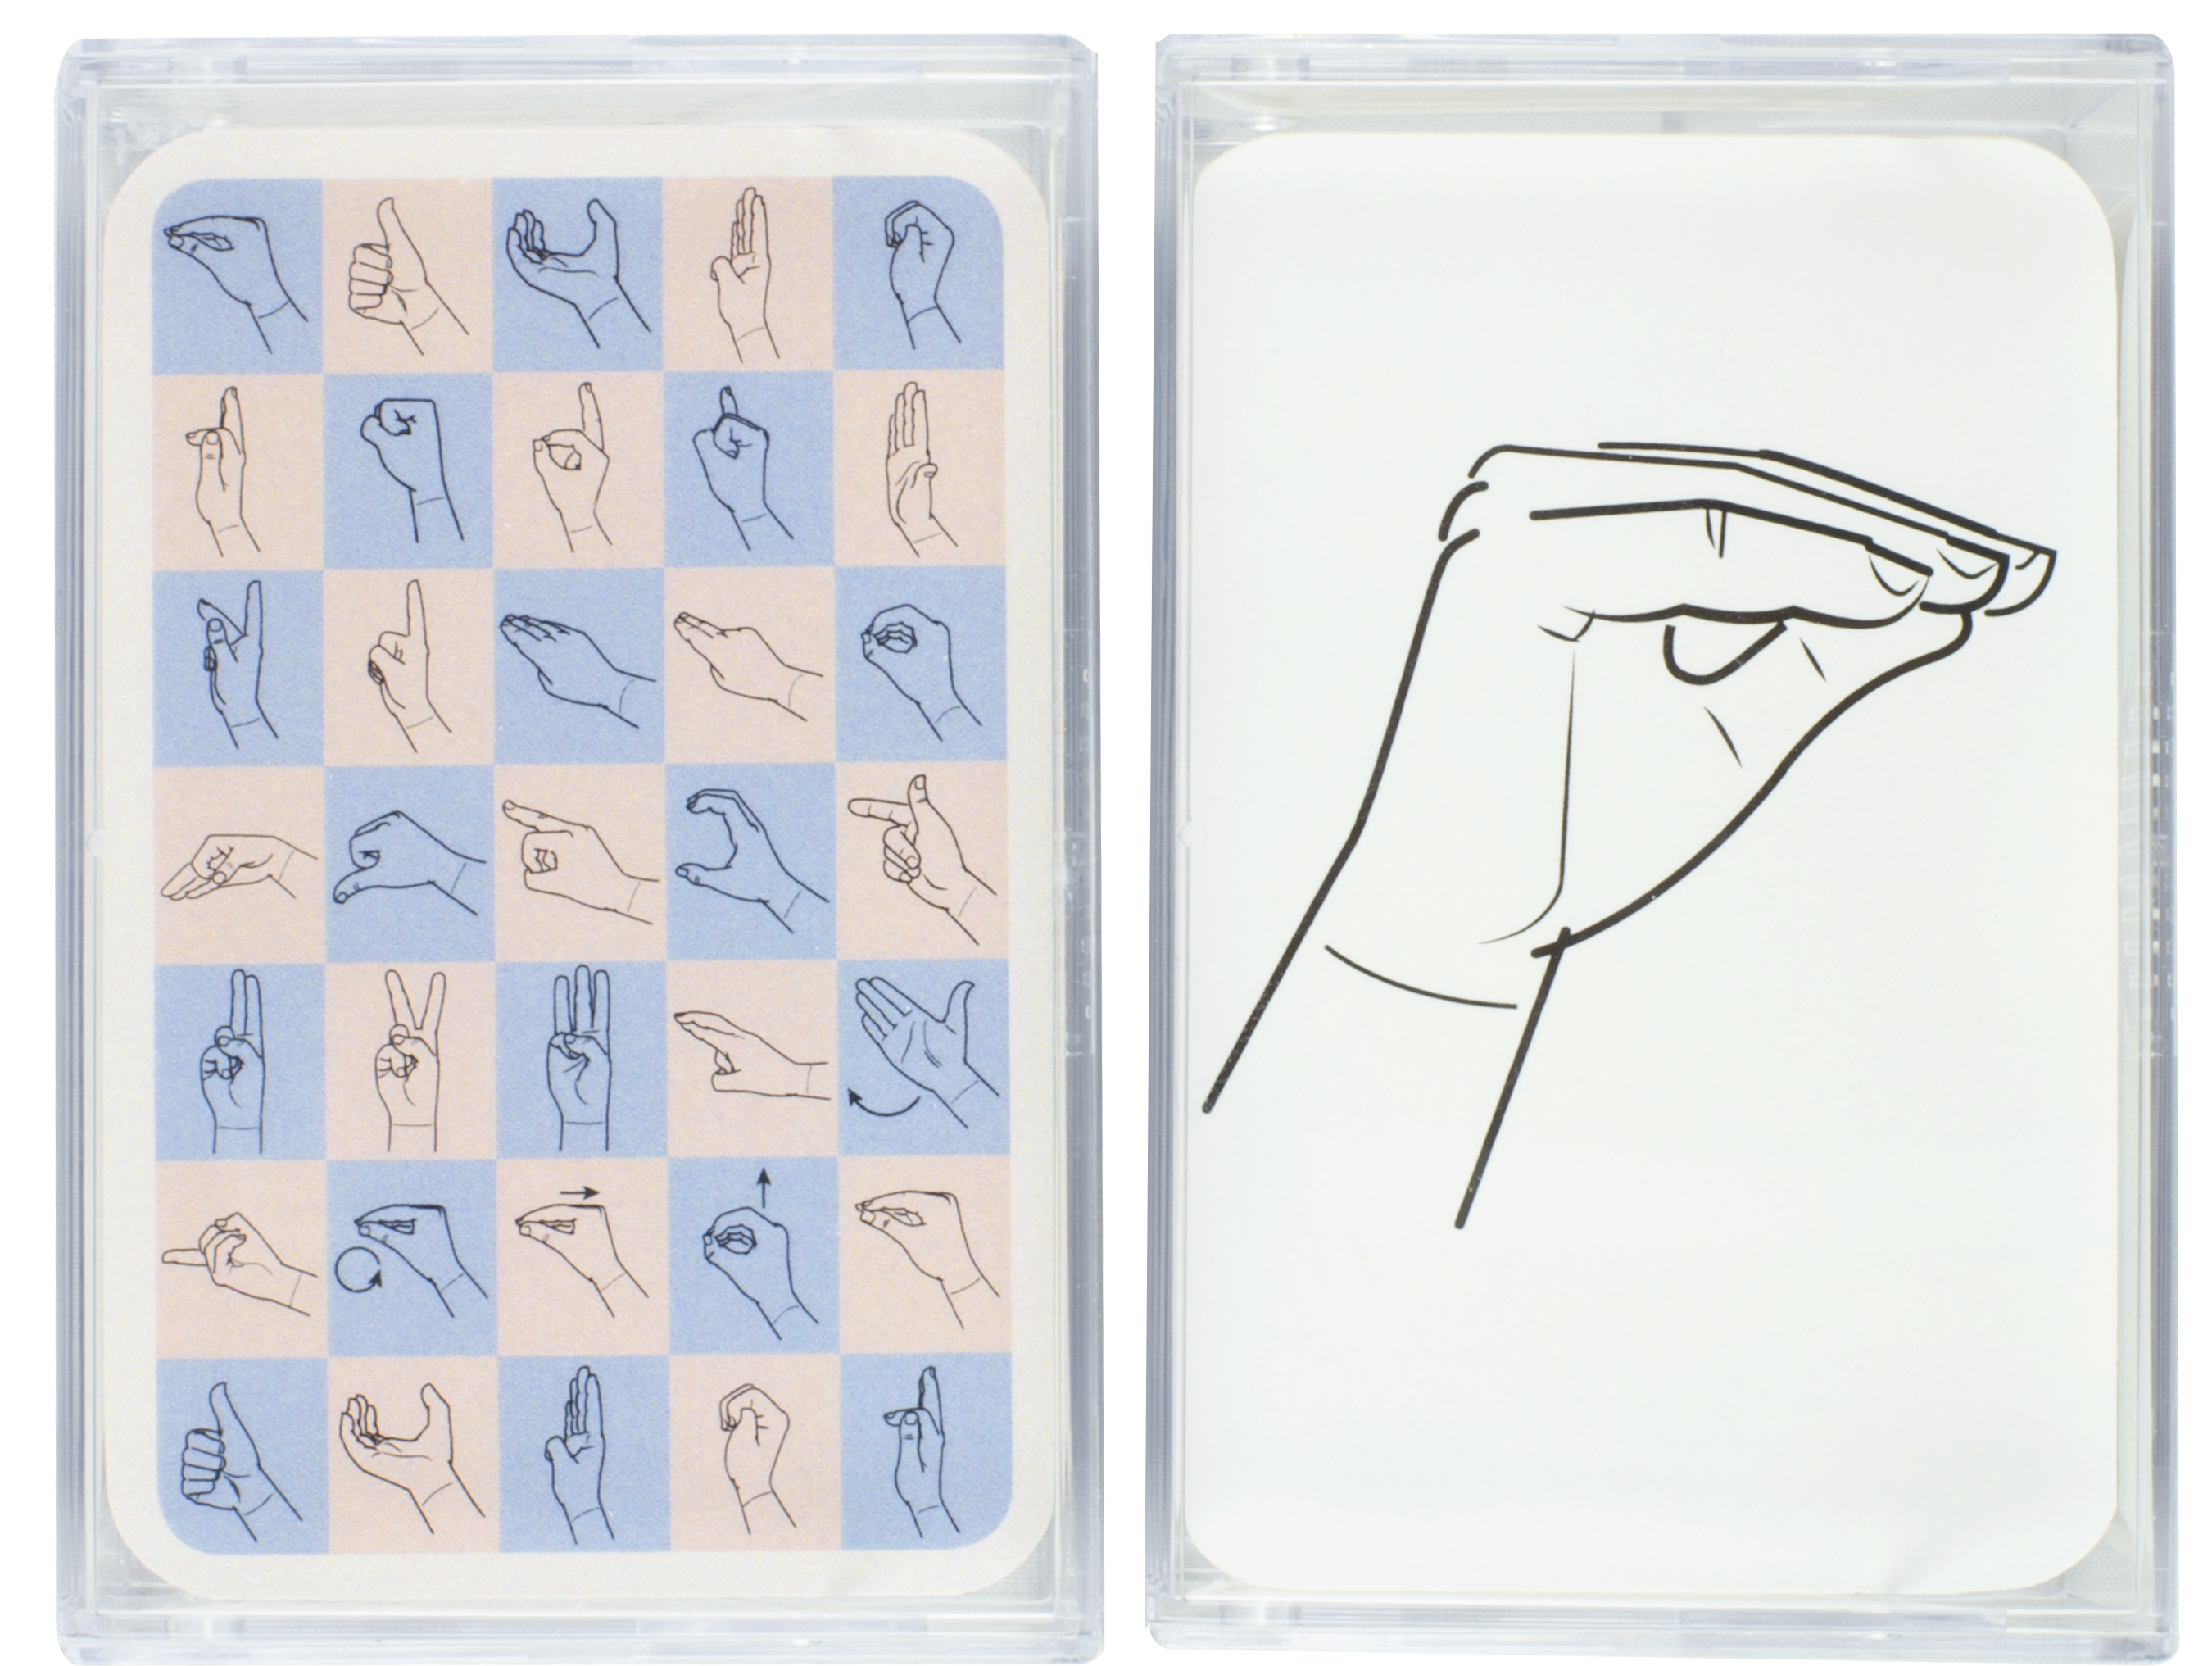 Kortlek teckenspråkets handalfabet.